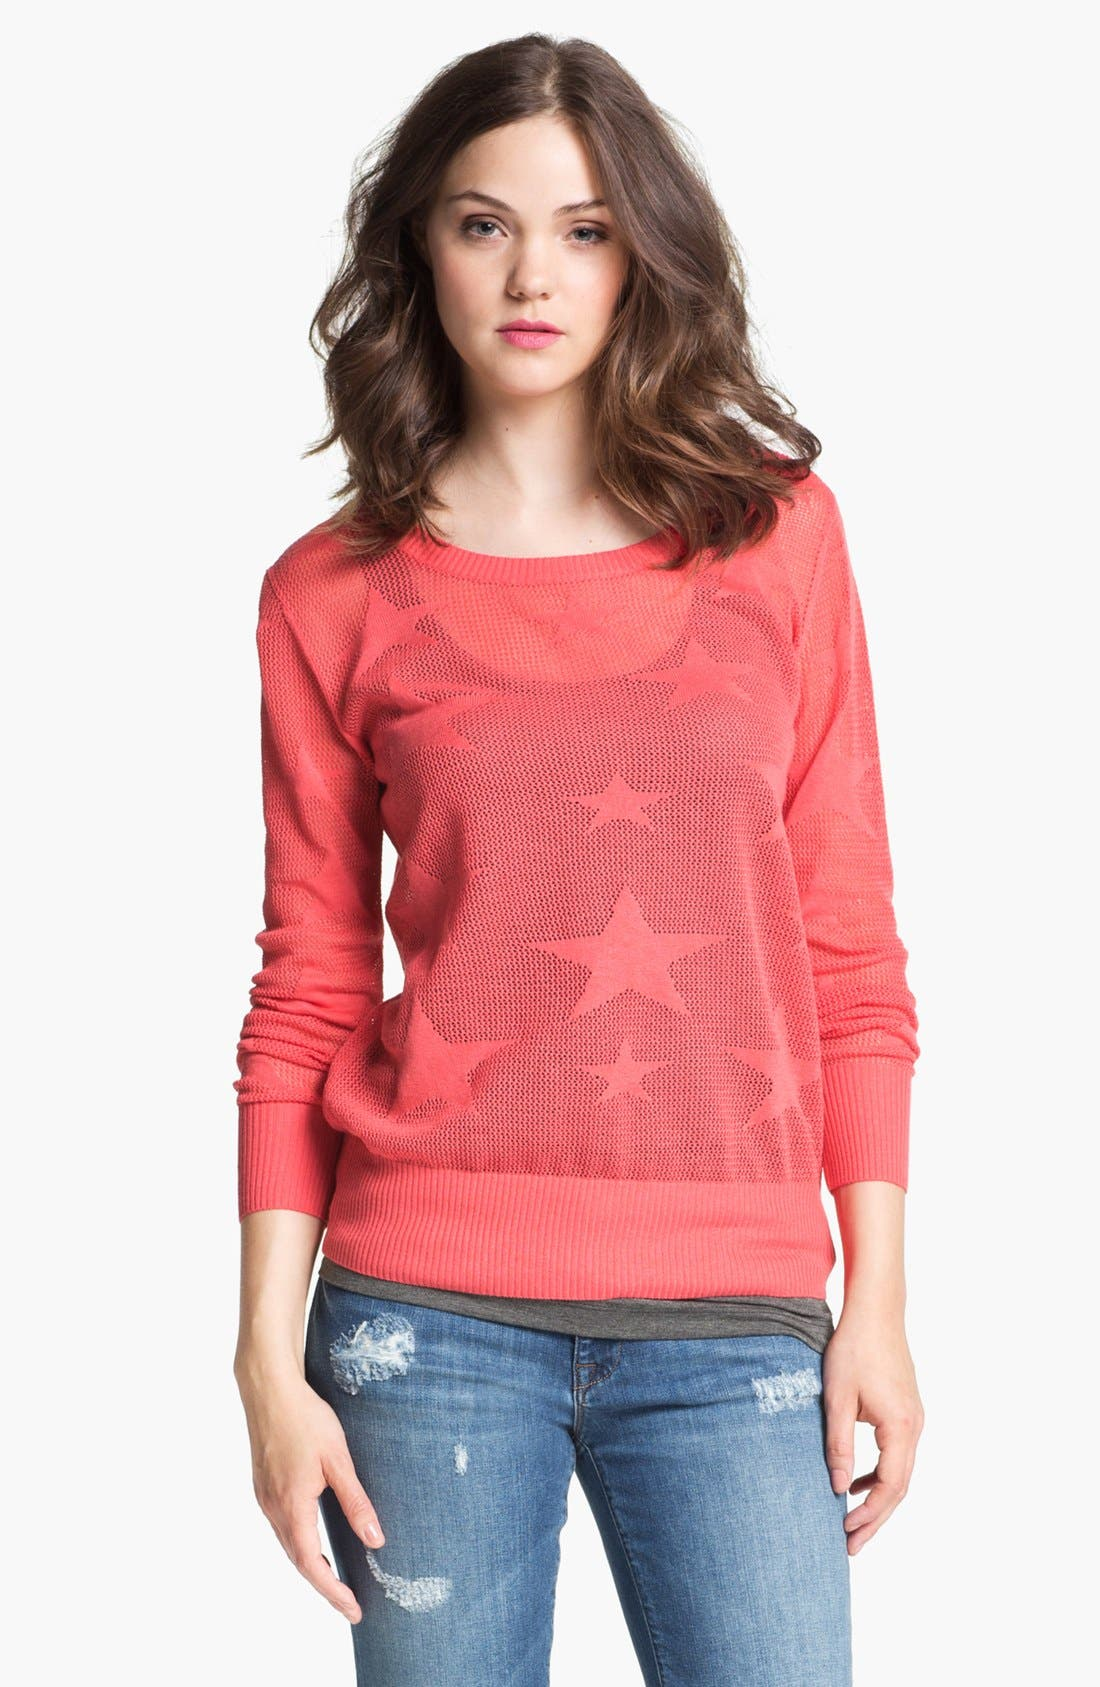 Main Image - Max & Mia Star Sweater